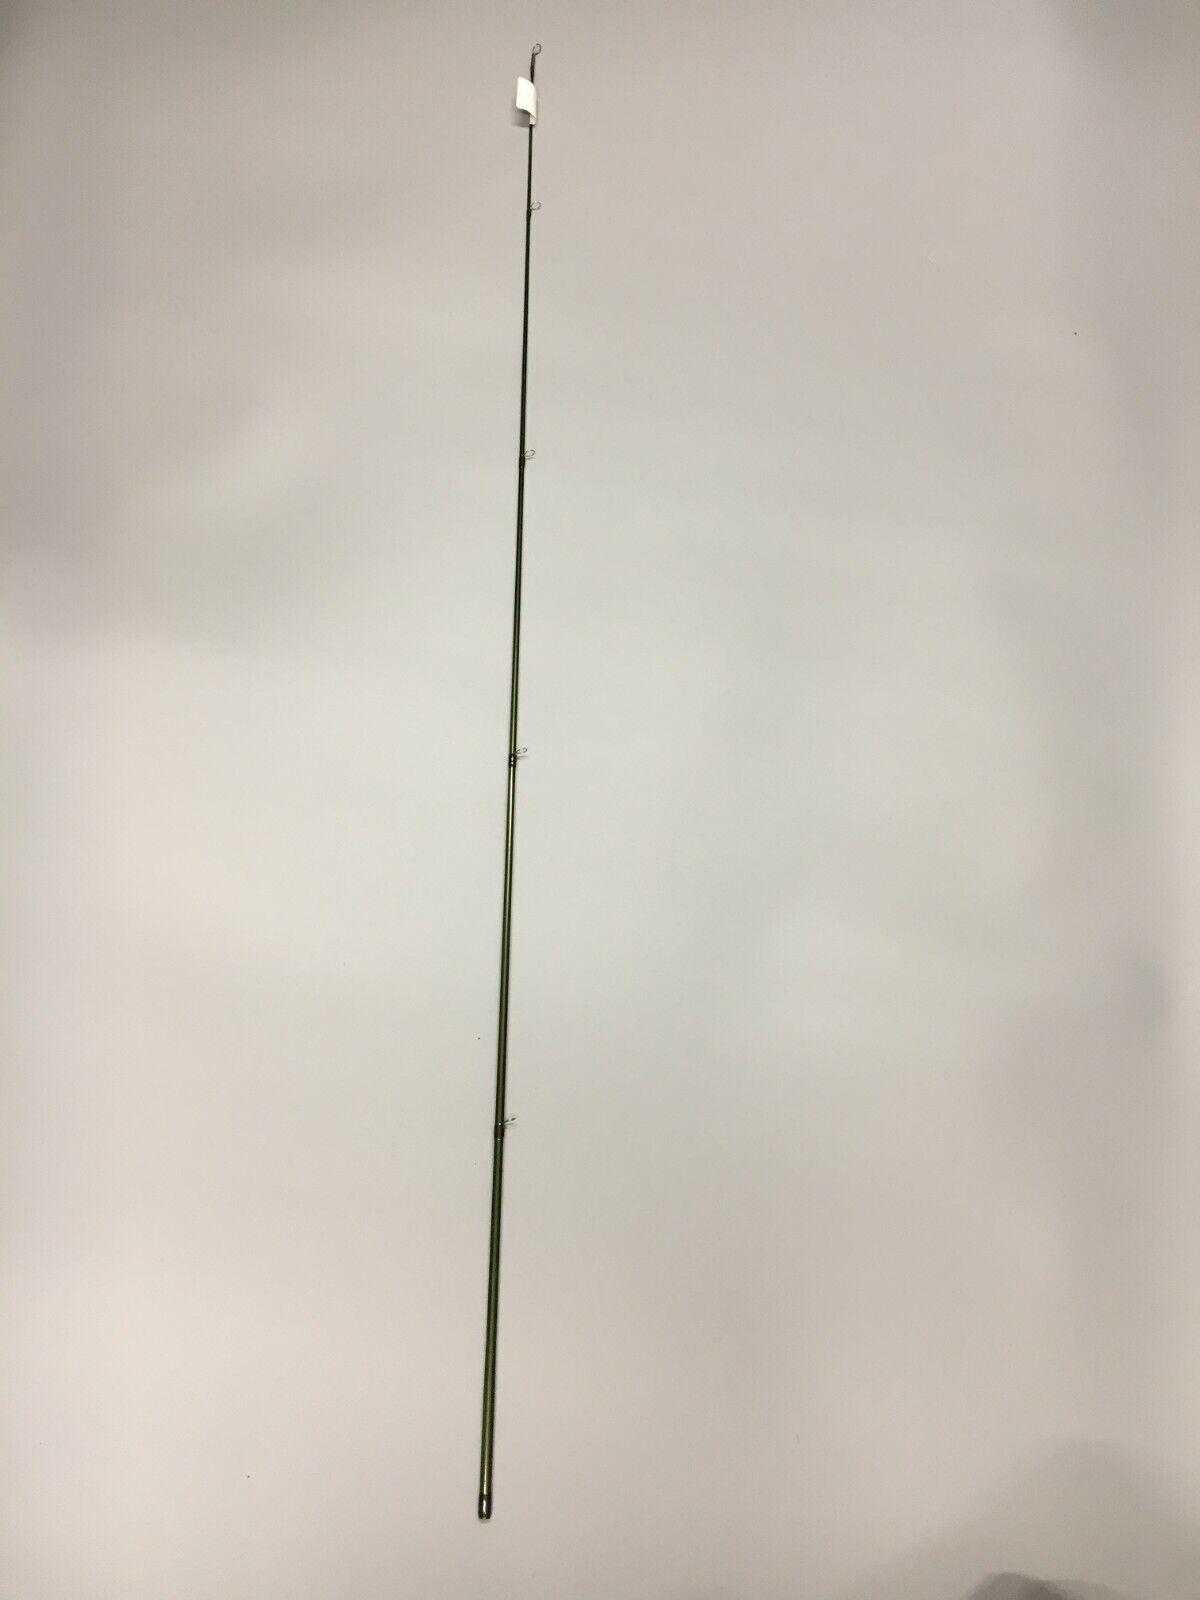 G LOOMIS STINGER 4pc 15'1 Tip Section Nur